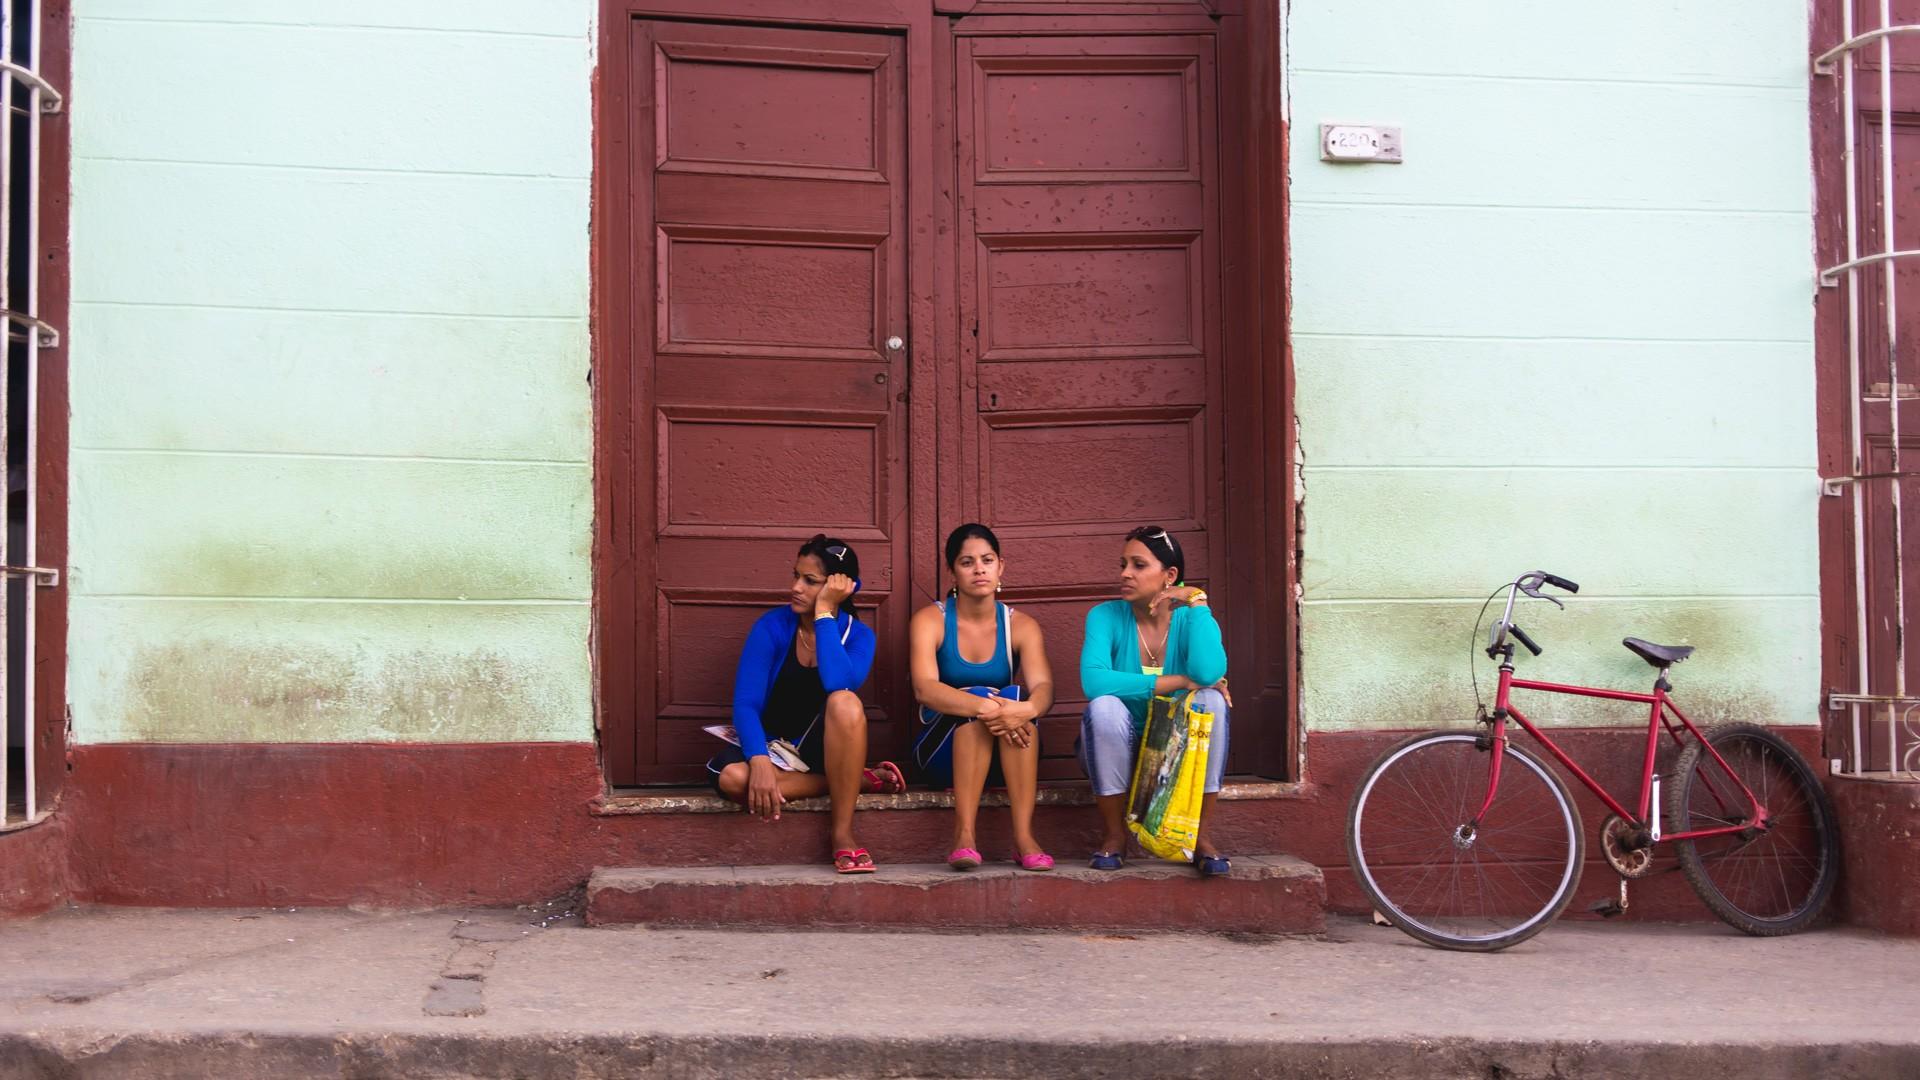 Damien-Dohmen-Photographe-Cuba-37